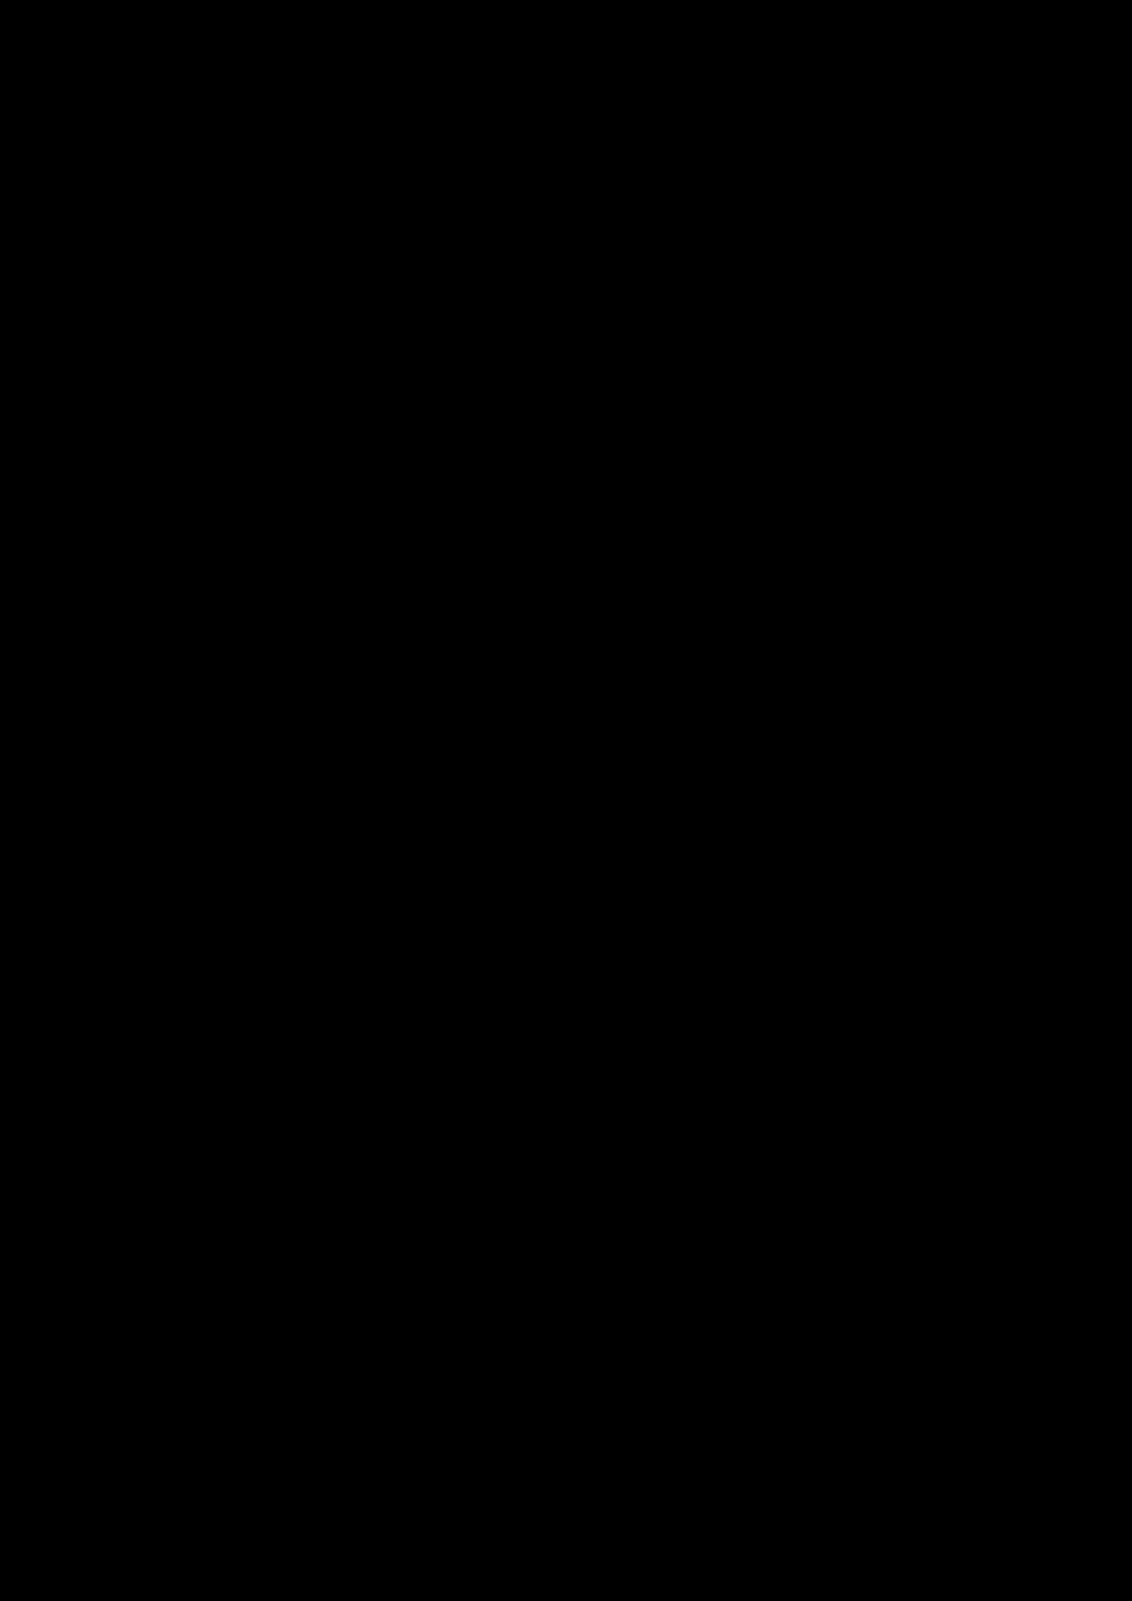 Belyiy sokol slide, Image 118